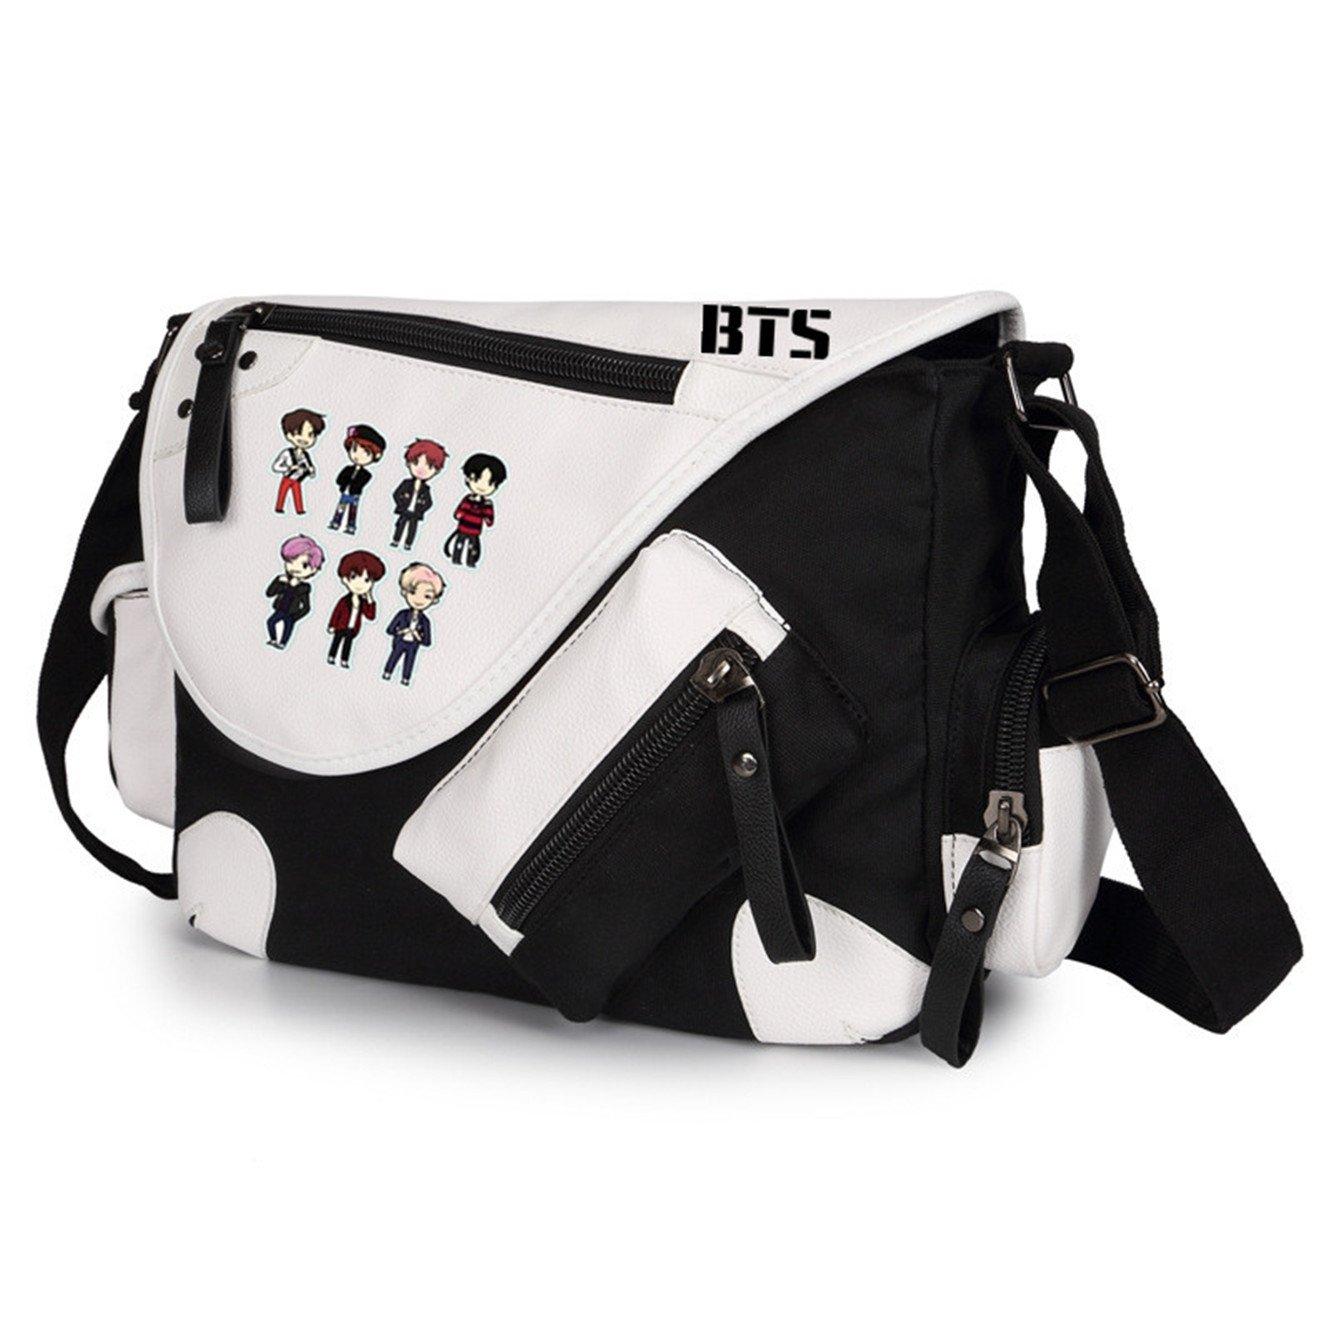 JUSTGOGO Casual Messenger Bag Crossbody Bag Shoulder Bag Travel Bag Handbag Tote Bag (Black)